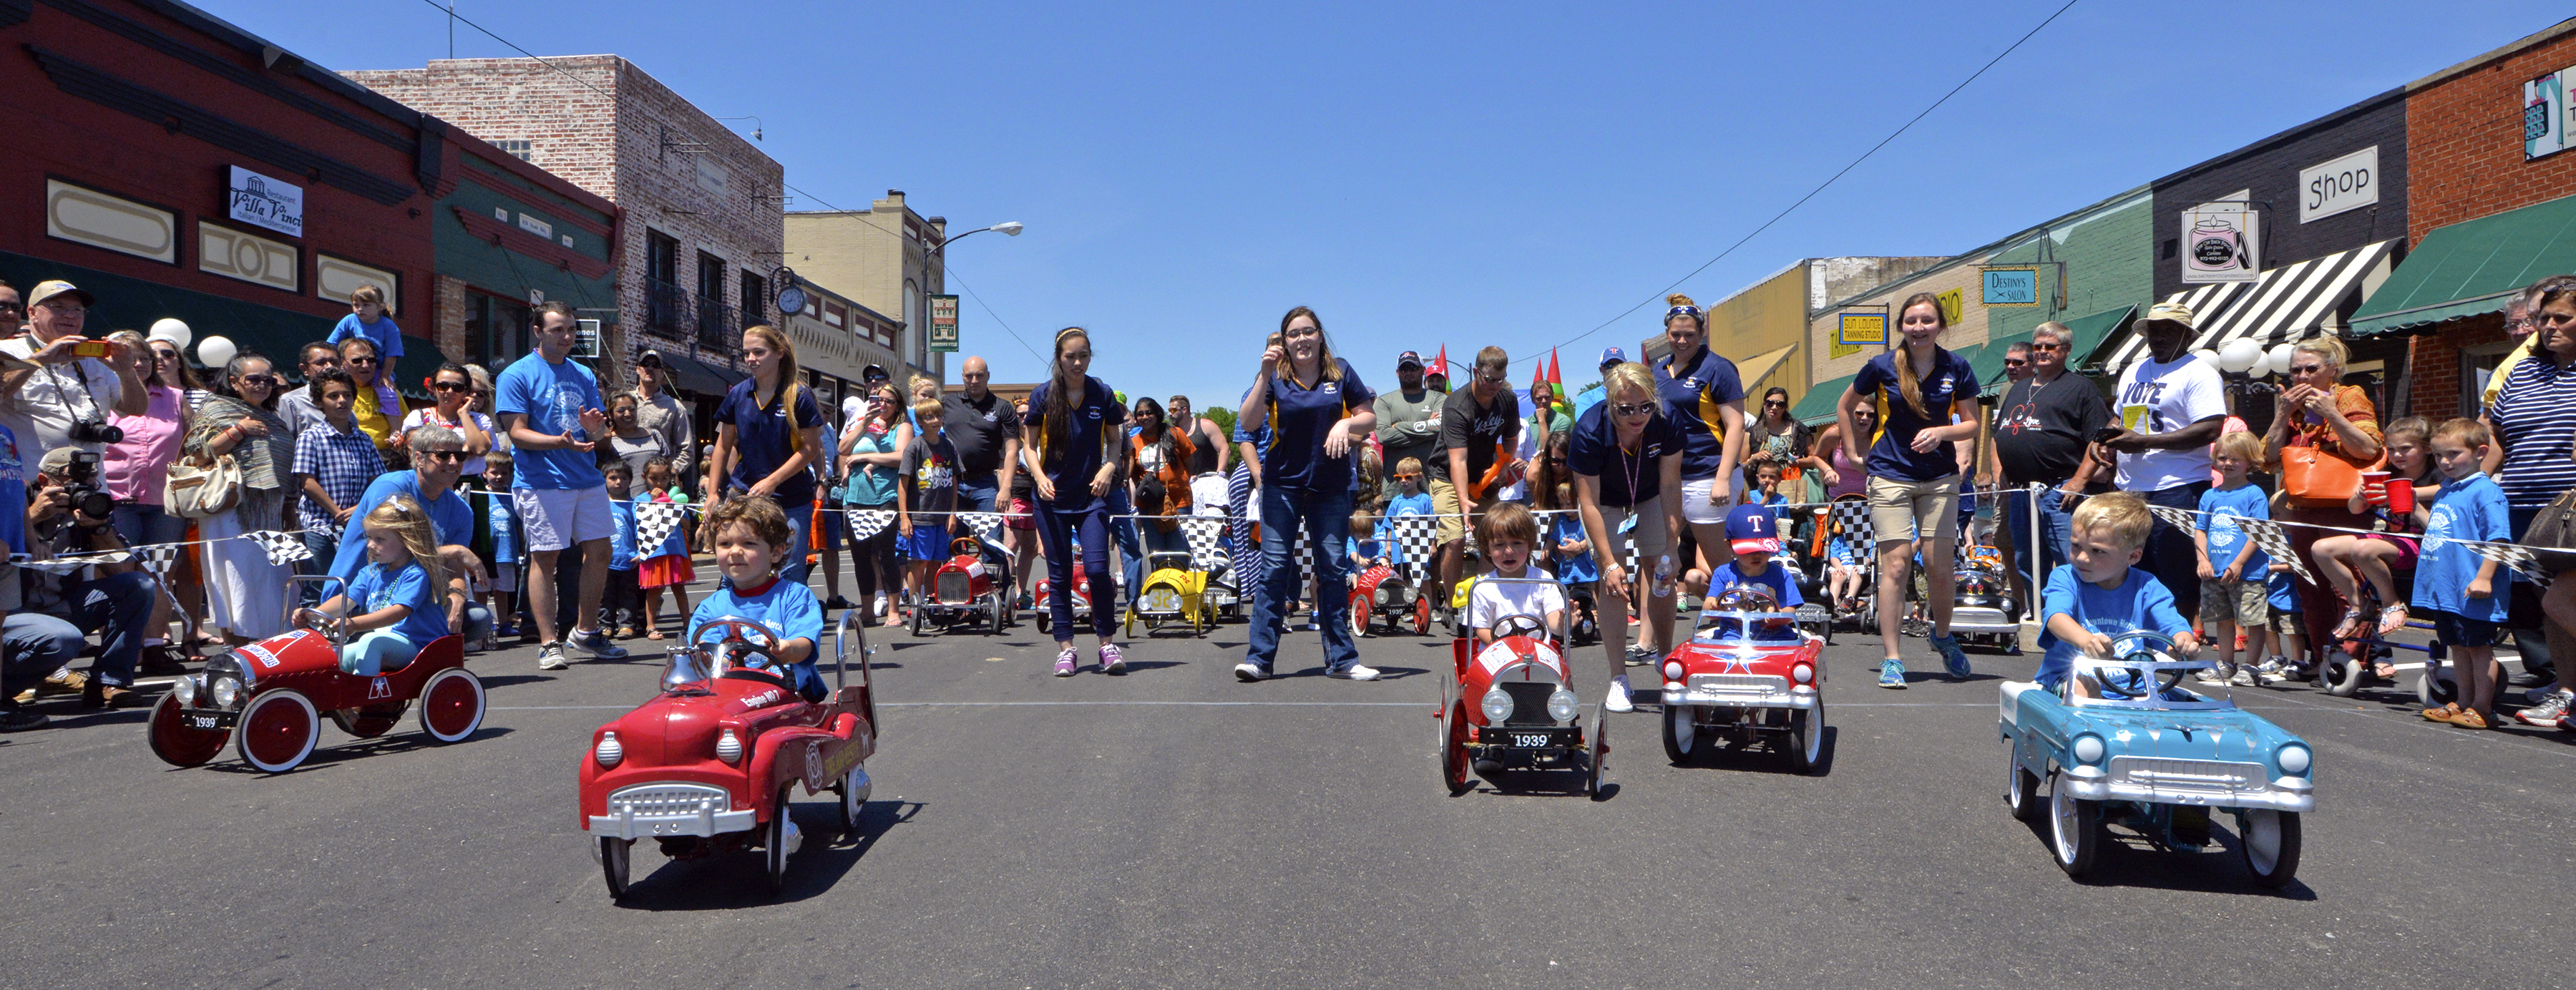 WDMA Pedal Car Race